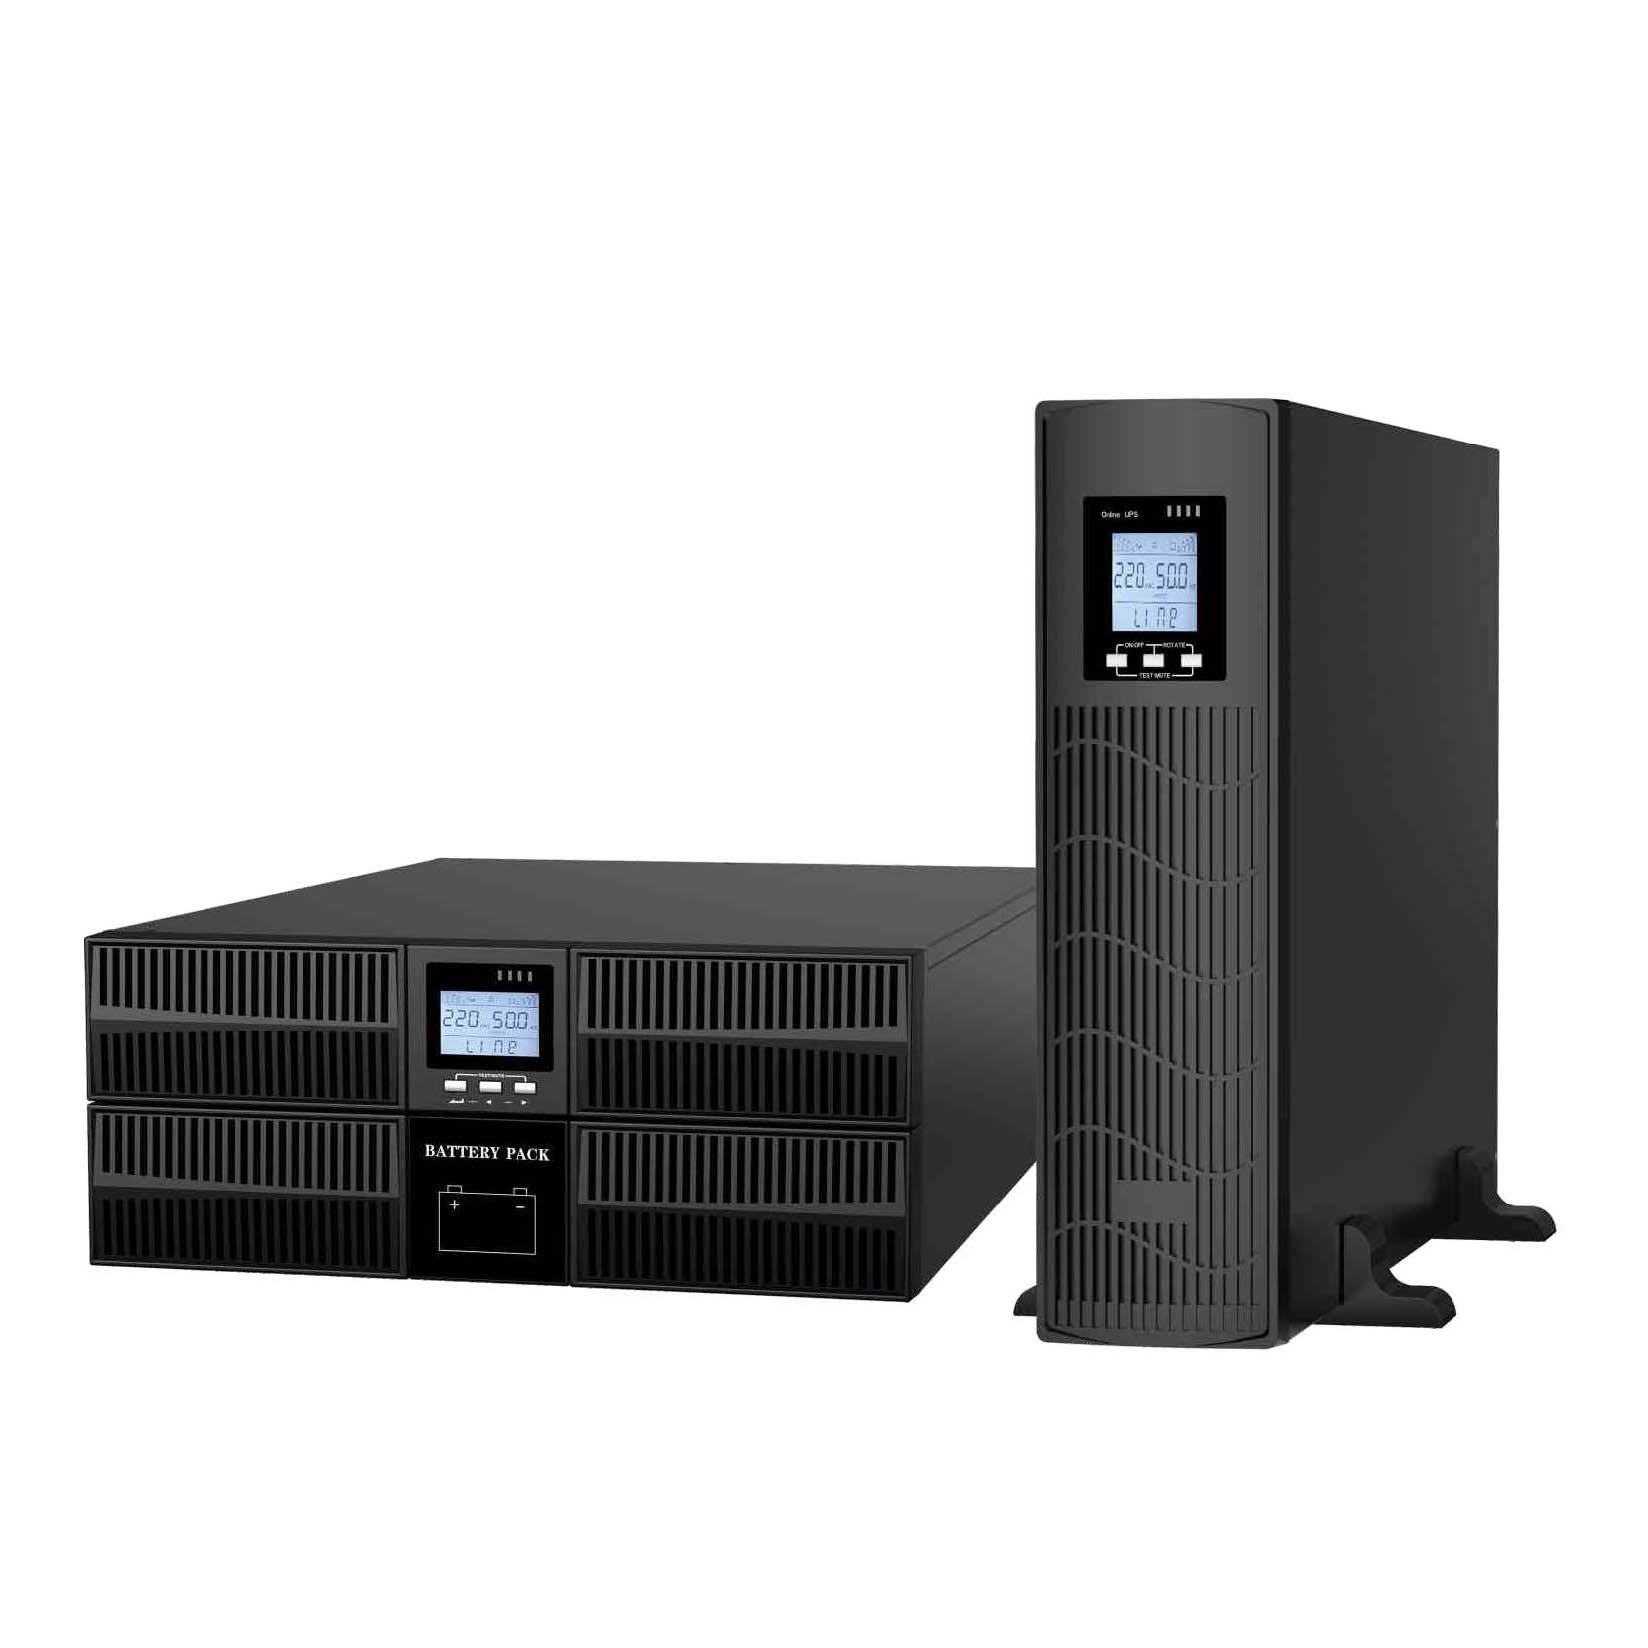 EA900Pro 10 kVA ~ 30 kVA (3:3)-EAST Group Limited by Share Ltd